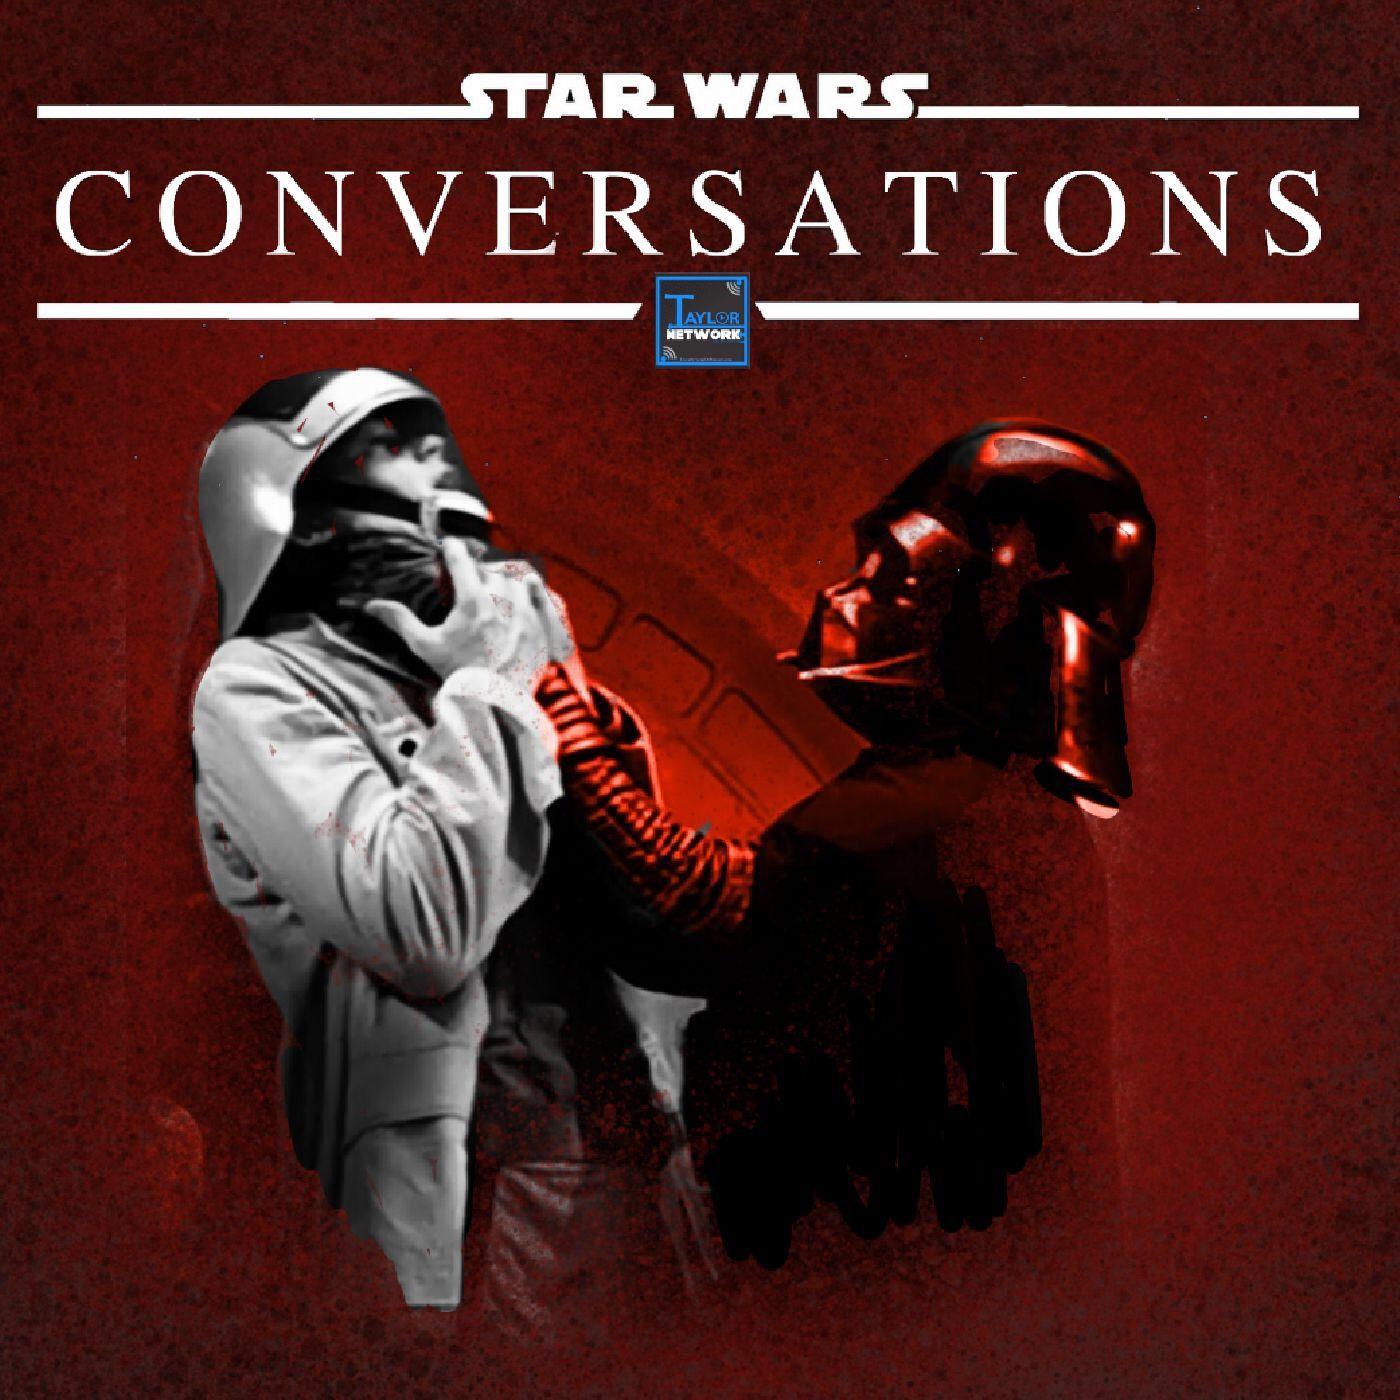 Star Wars Conversations